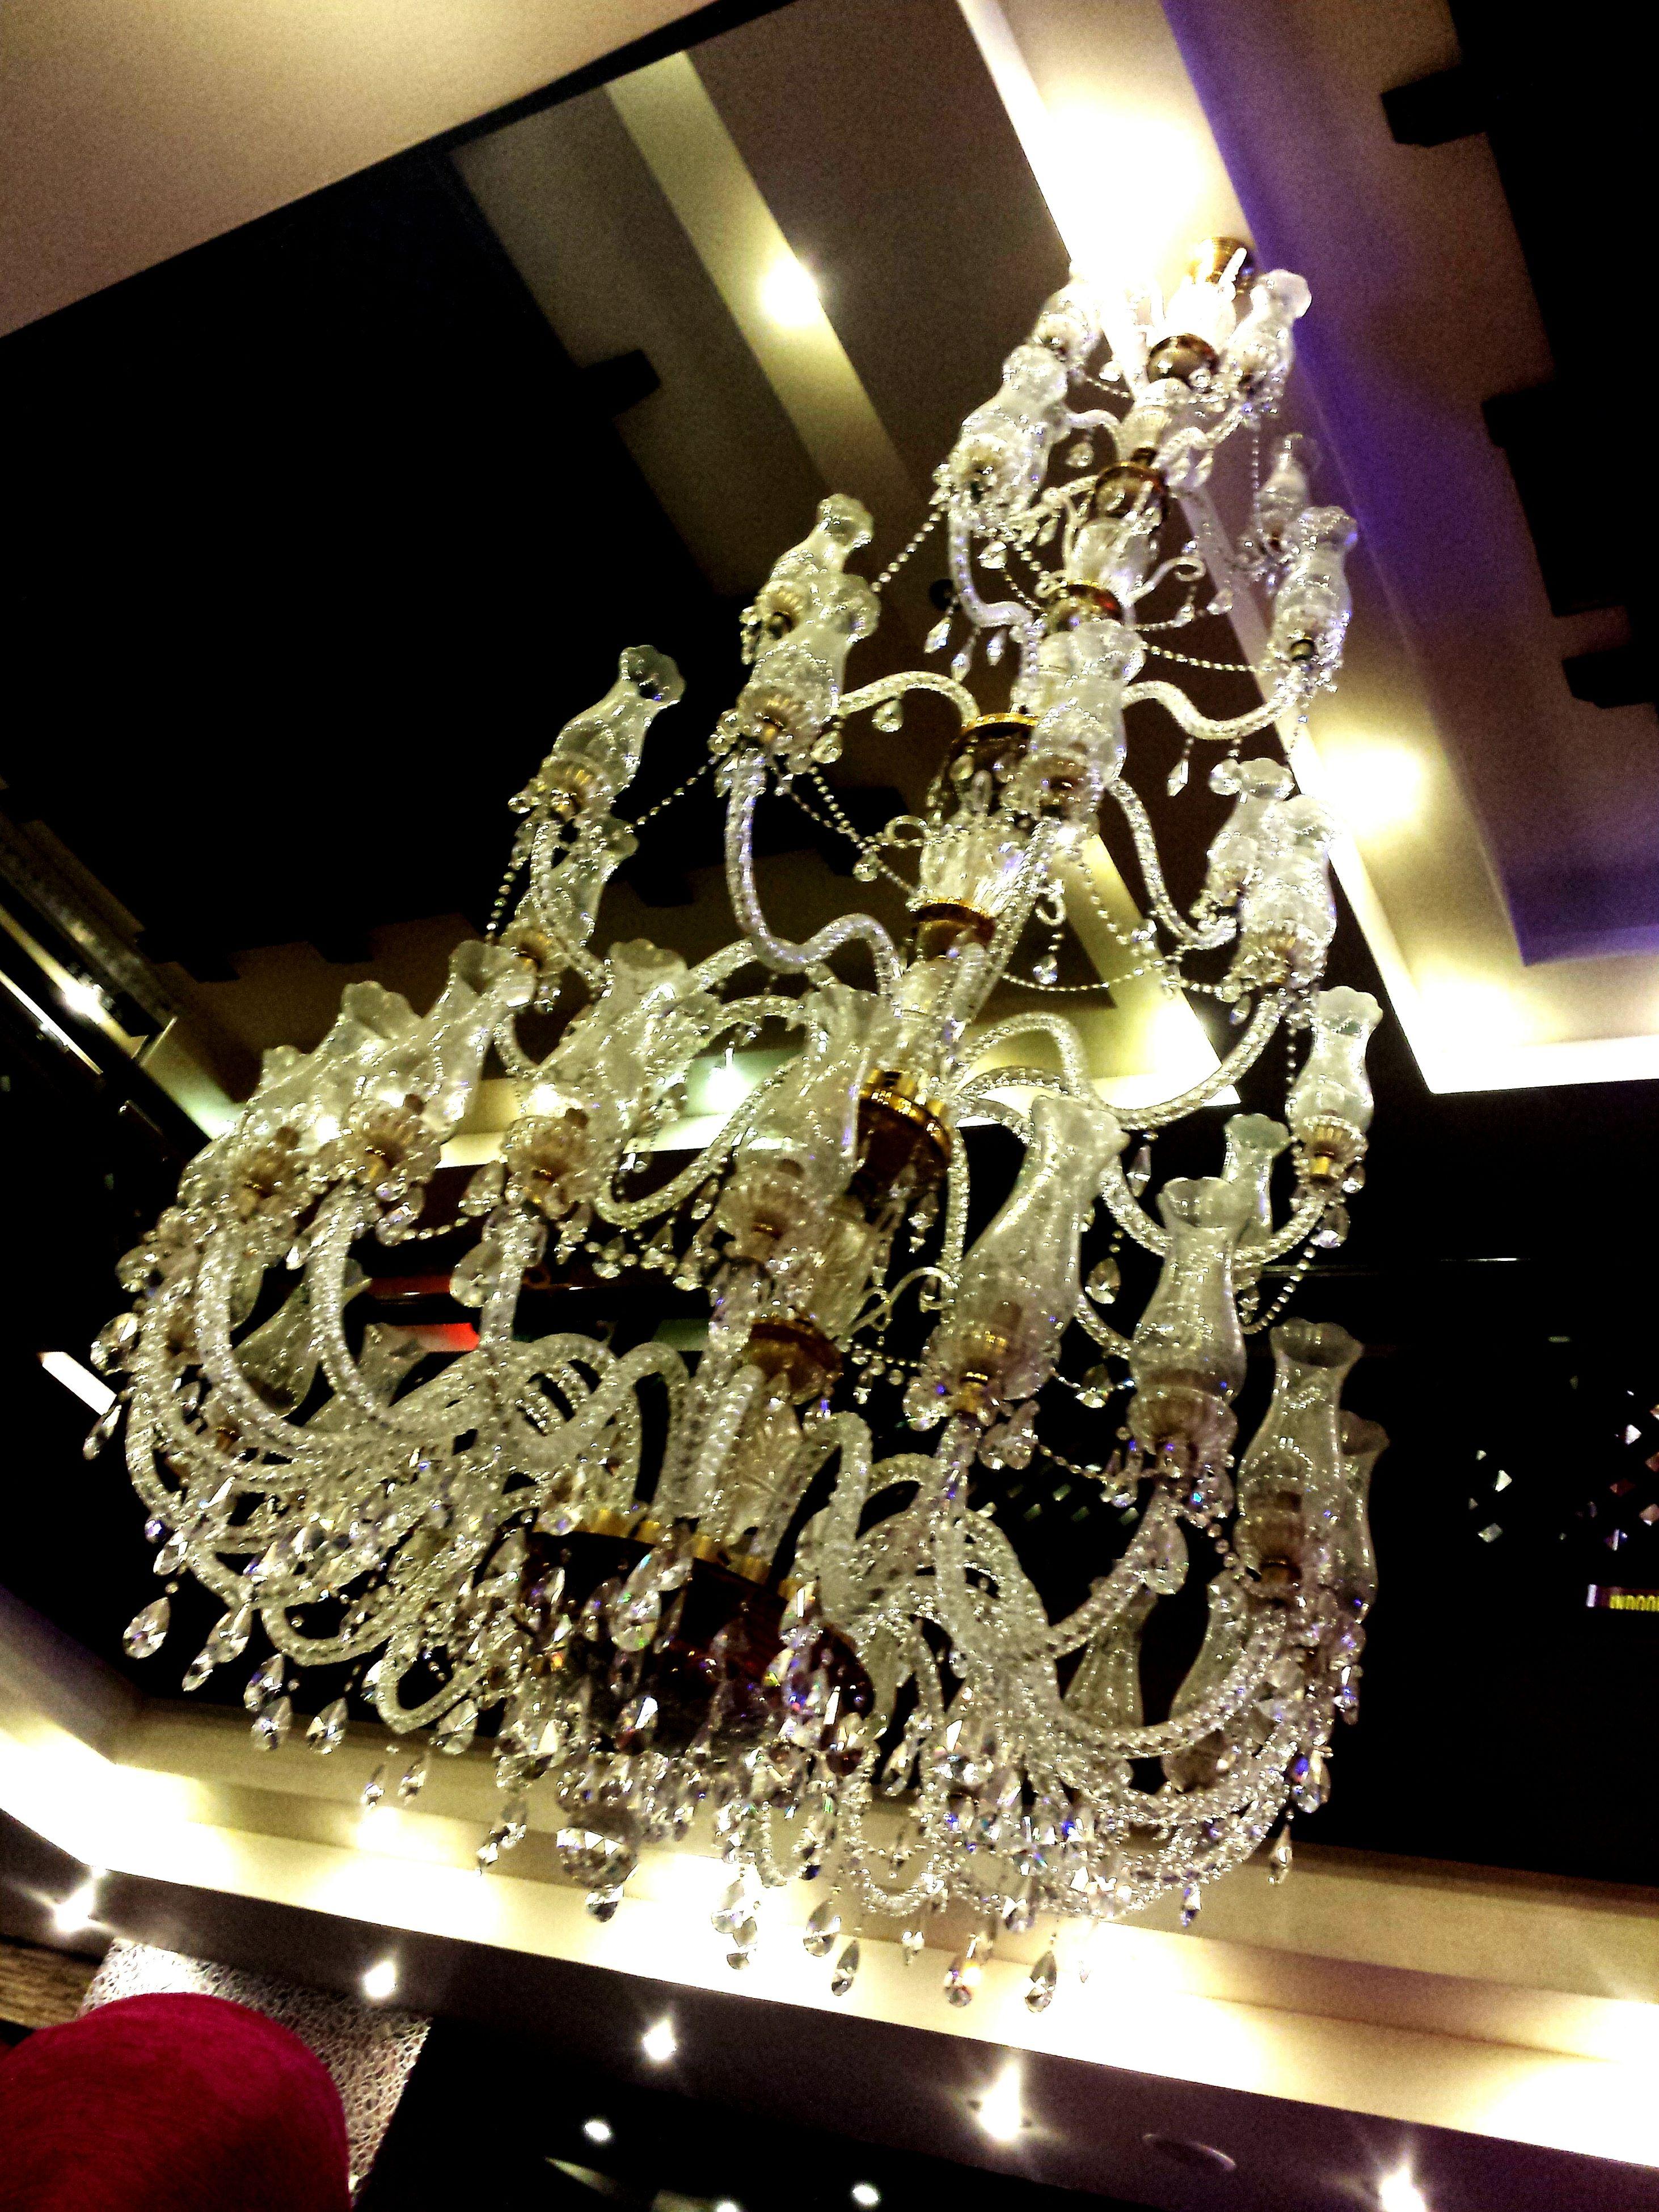 indoors, illuminated, home interior, decoration, decor, hanging, art and craft, close-up, still life, christmas, chandelier, table, art, no people, creativity, lighting equipment, celebration, ornate, tradition, human representation